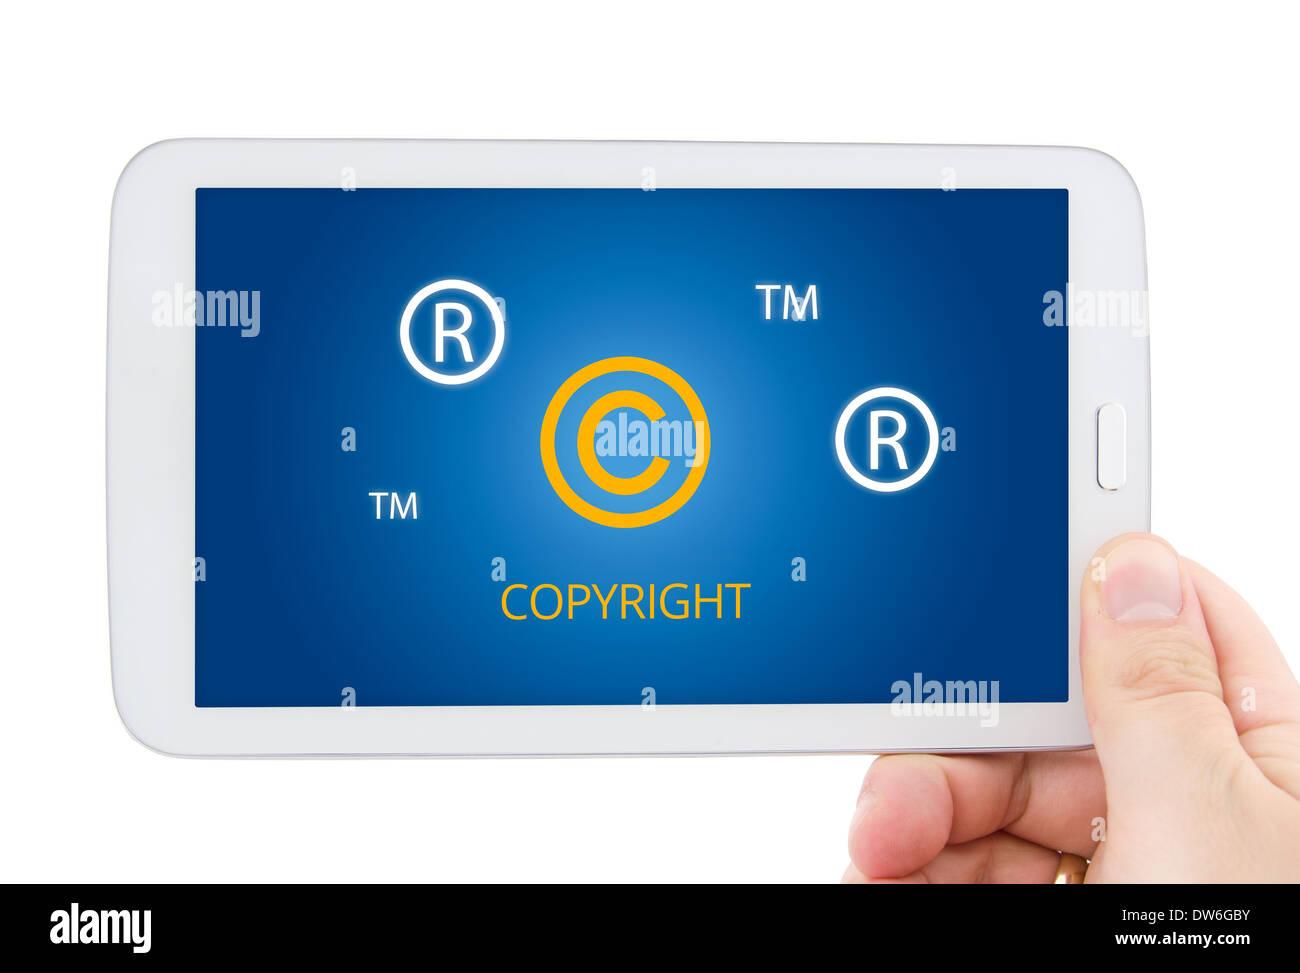 Trademark Symbols Stock Photos Trademark Symbols Stock Images Alamy